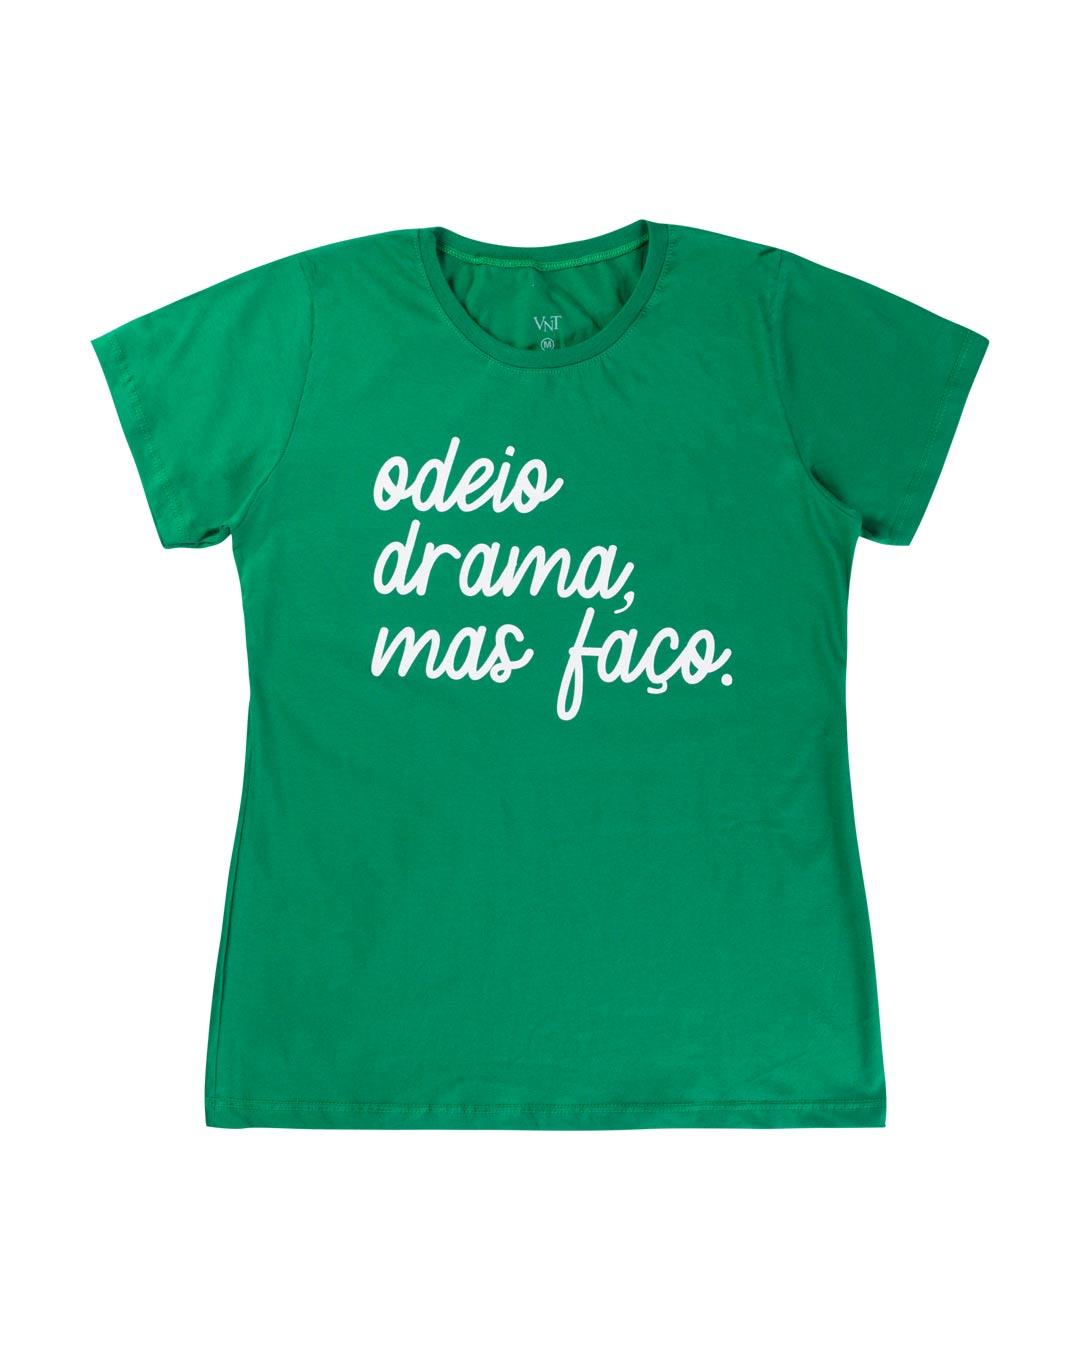 T-Shirt Adulta e Plus Size Odeio Drama Mas Faço - Santa Margô